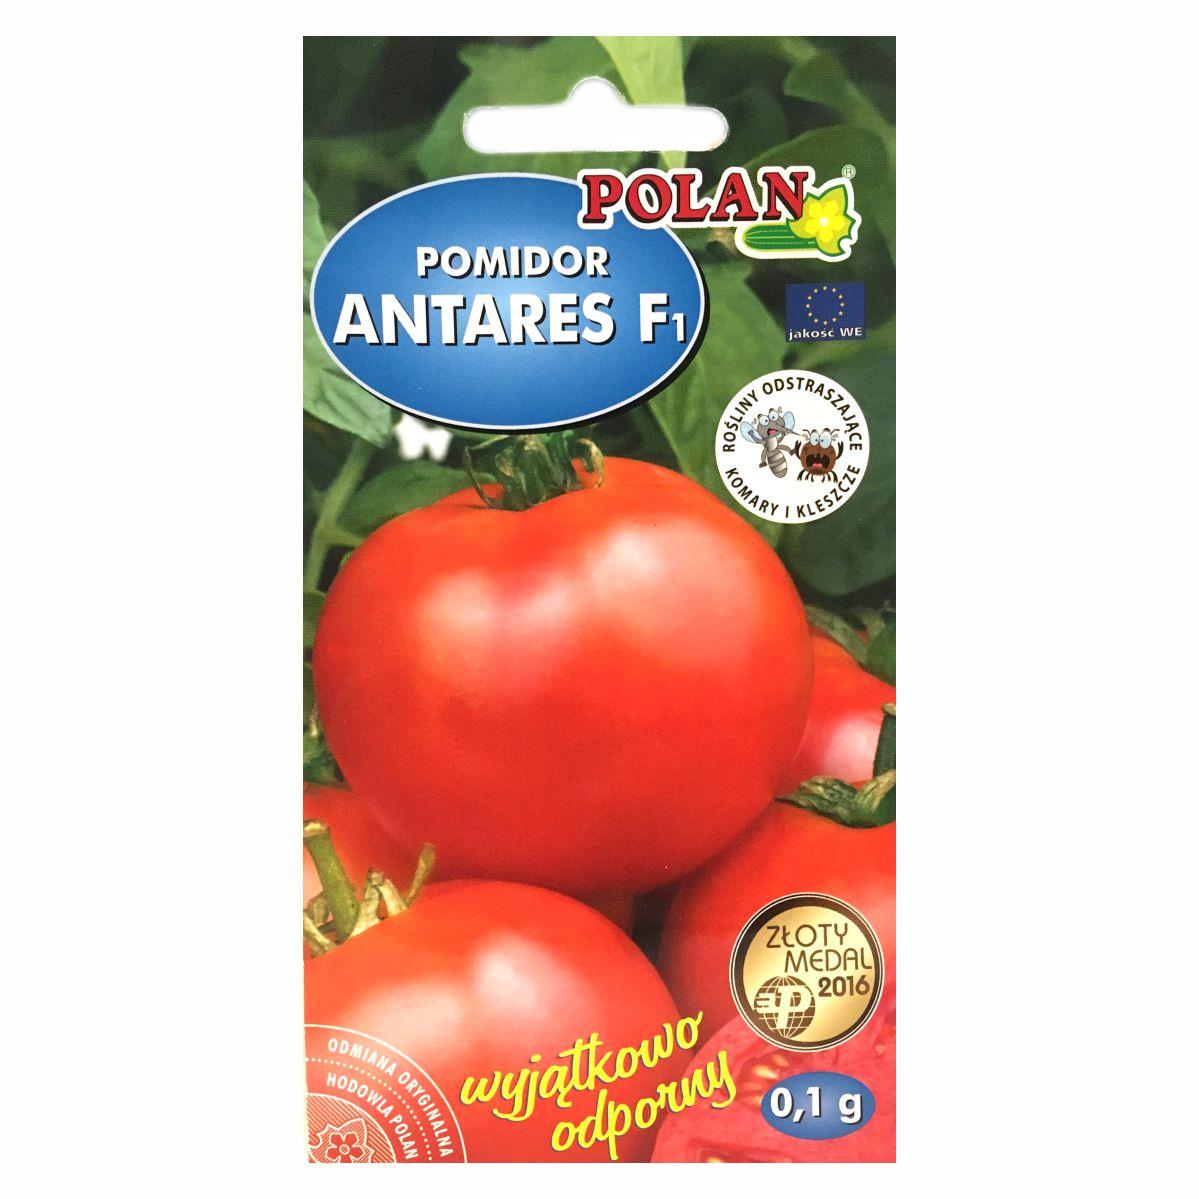 Pomidor Antares F1 nasiona Polan